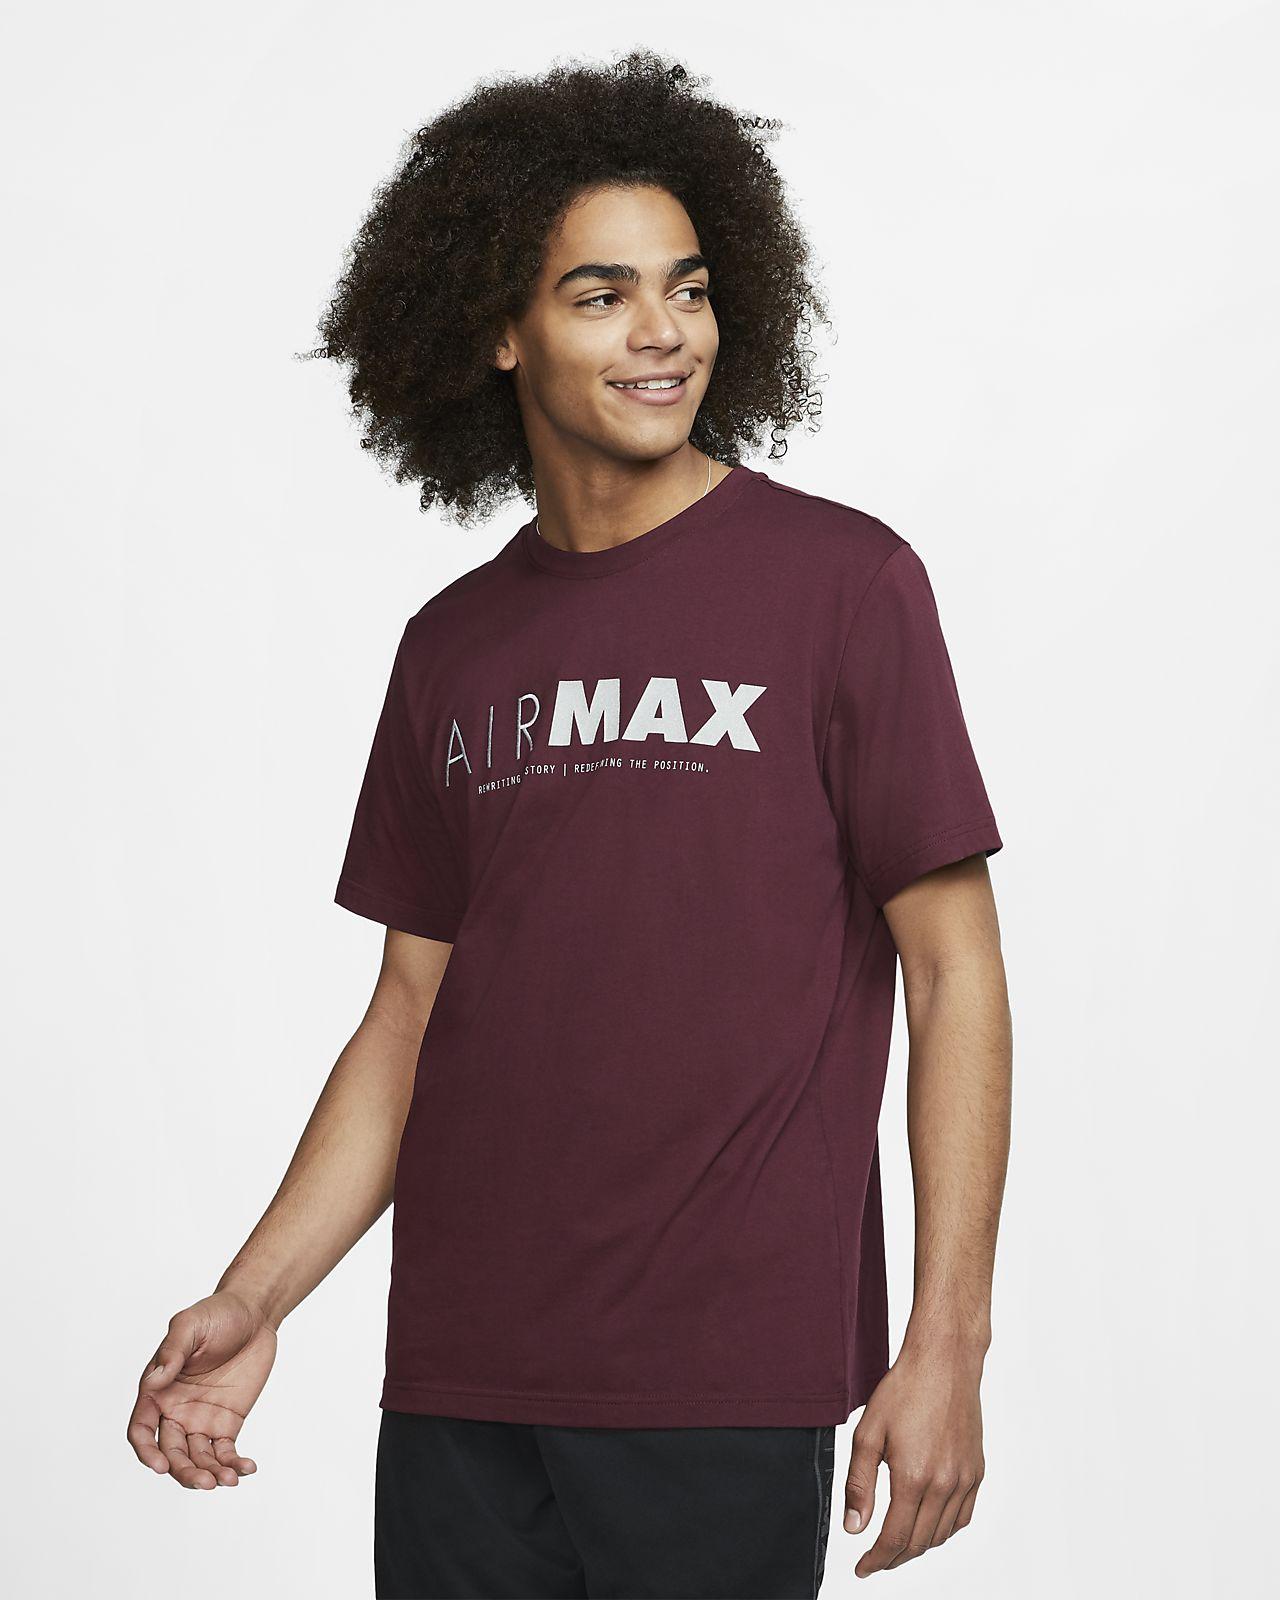 Tee-shirt à manches courtes et motif Nike Sportswear Air Max pour Homme